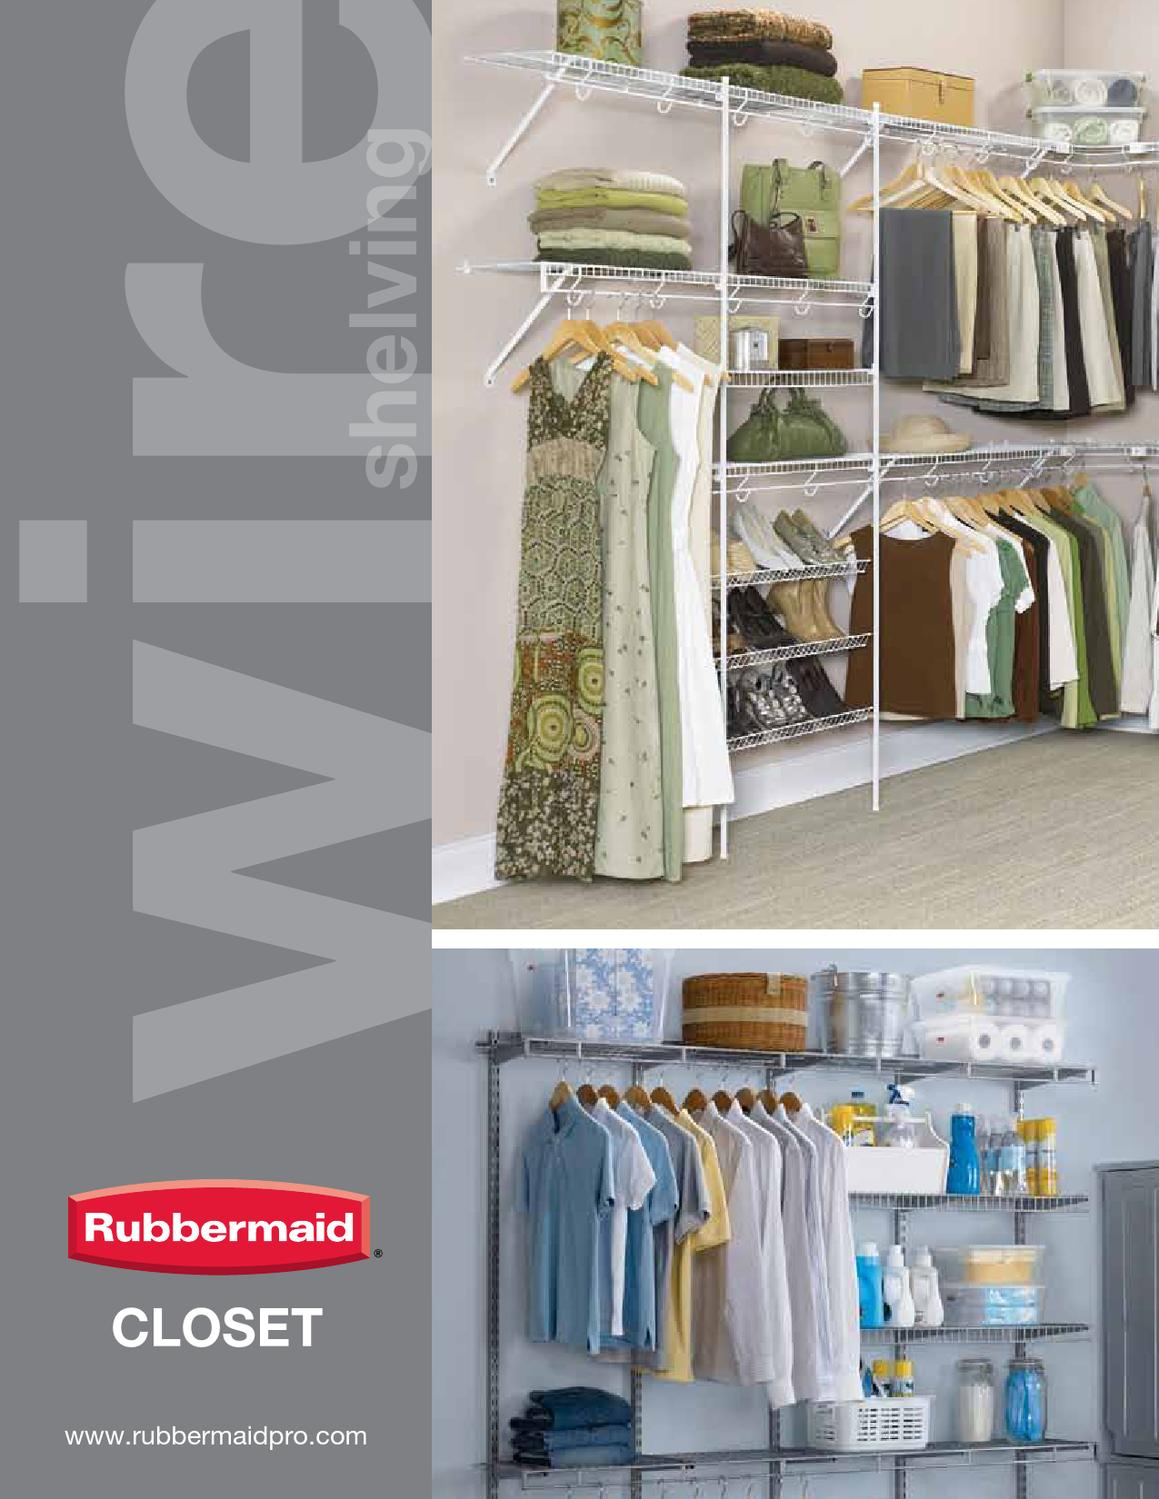 Rubbermaid Closet Shelving By Meek Lumber Company   Issuu